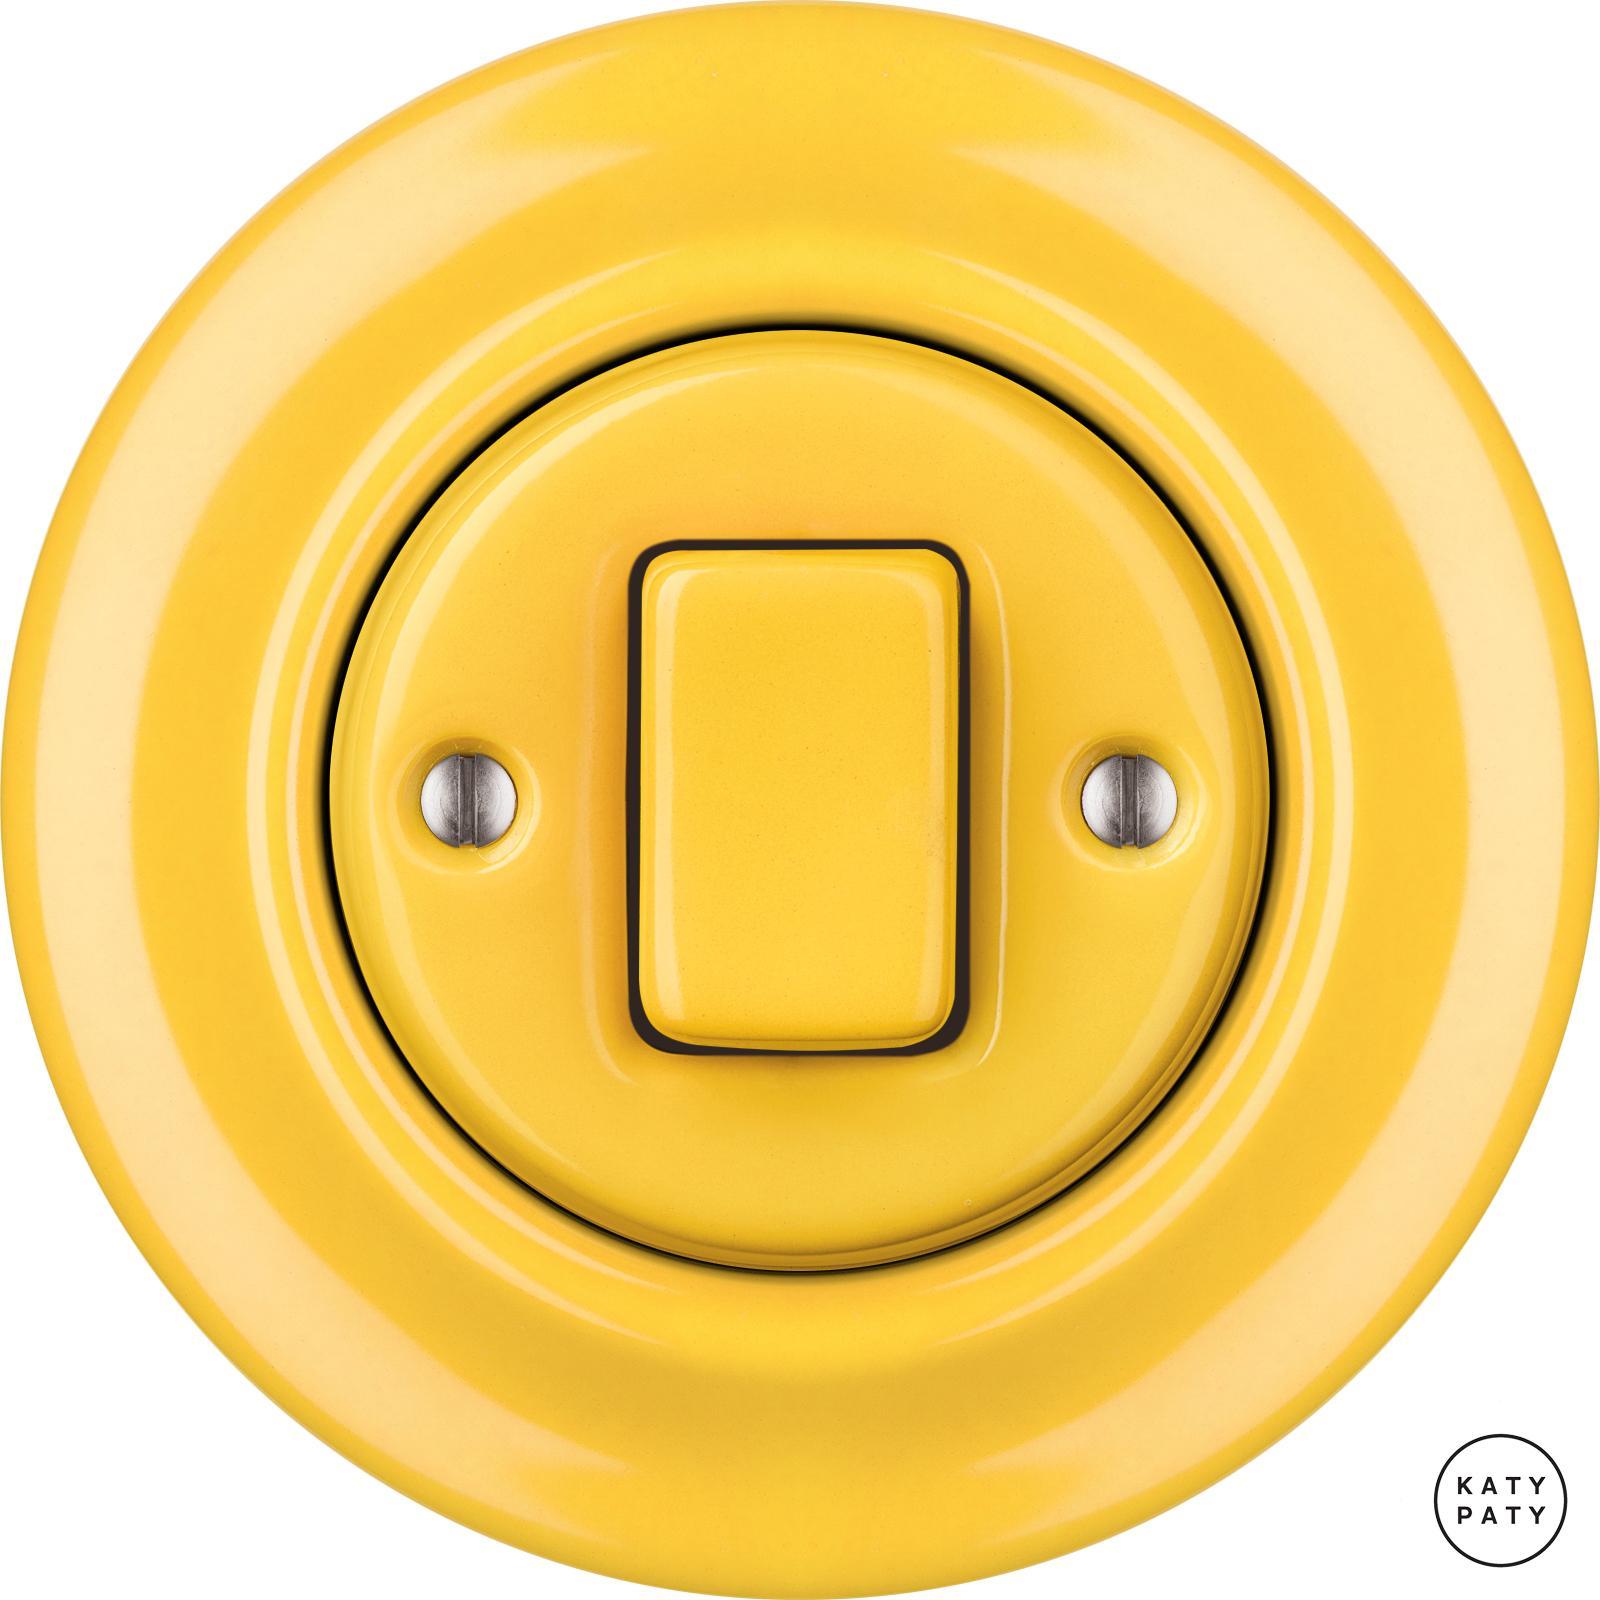 Berühmt Haus Lichtschalter Fotos - Schaltplan Serie Circuit ...